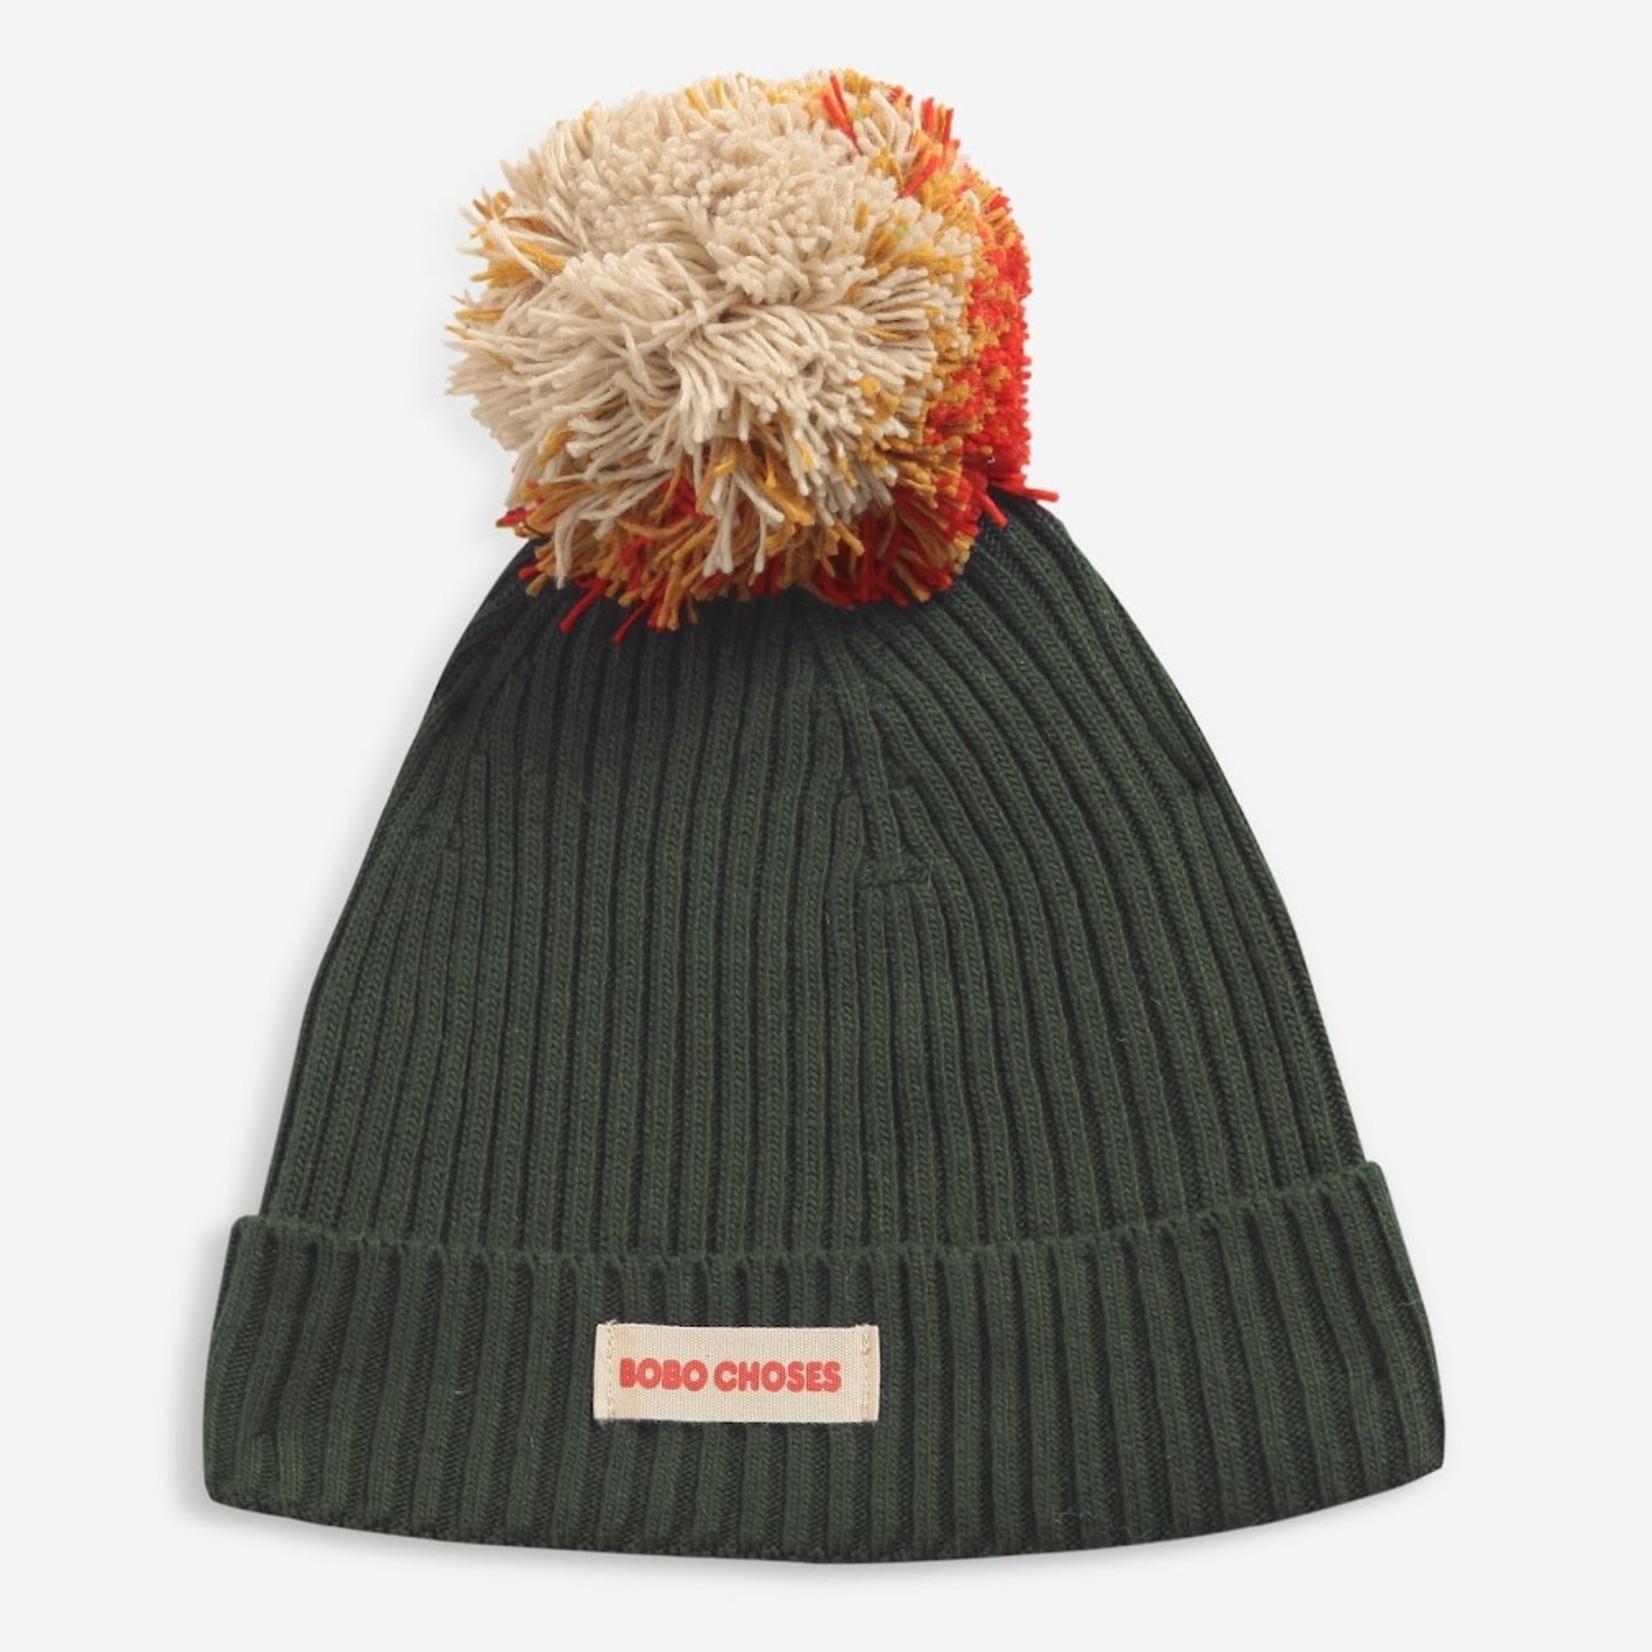 BOBO CHOSES BOBO CHOSES Pompom knitted beanie khaki